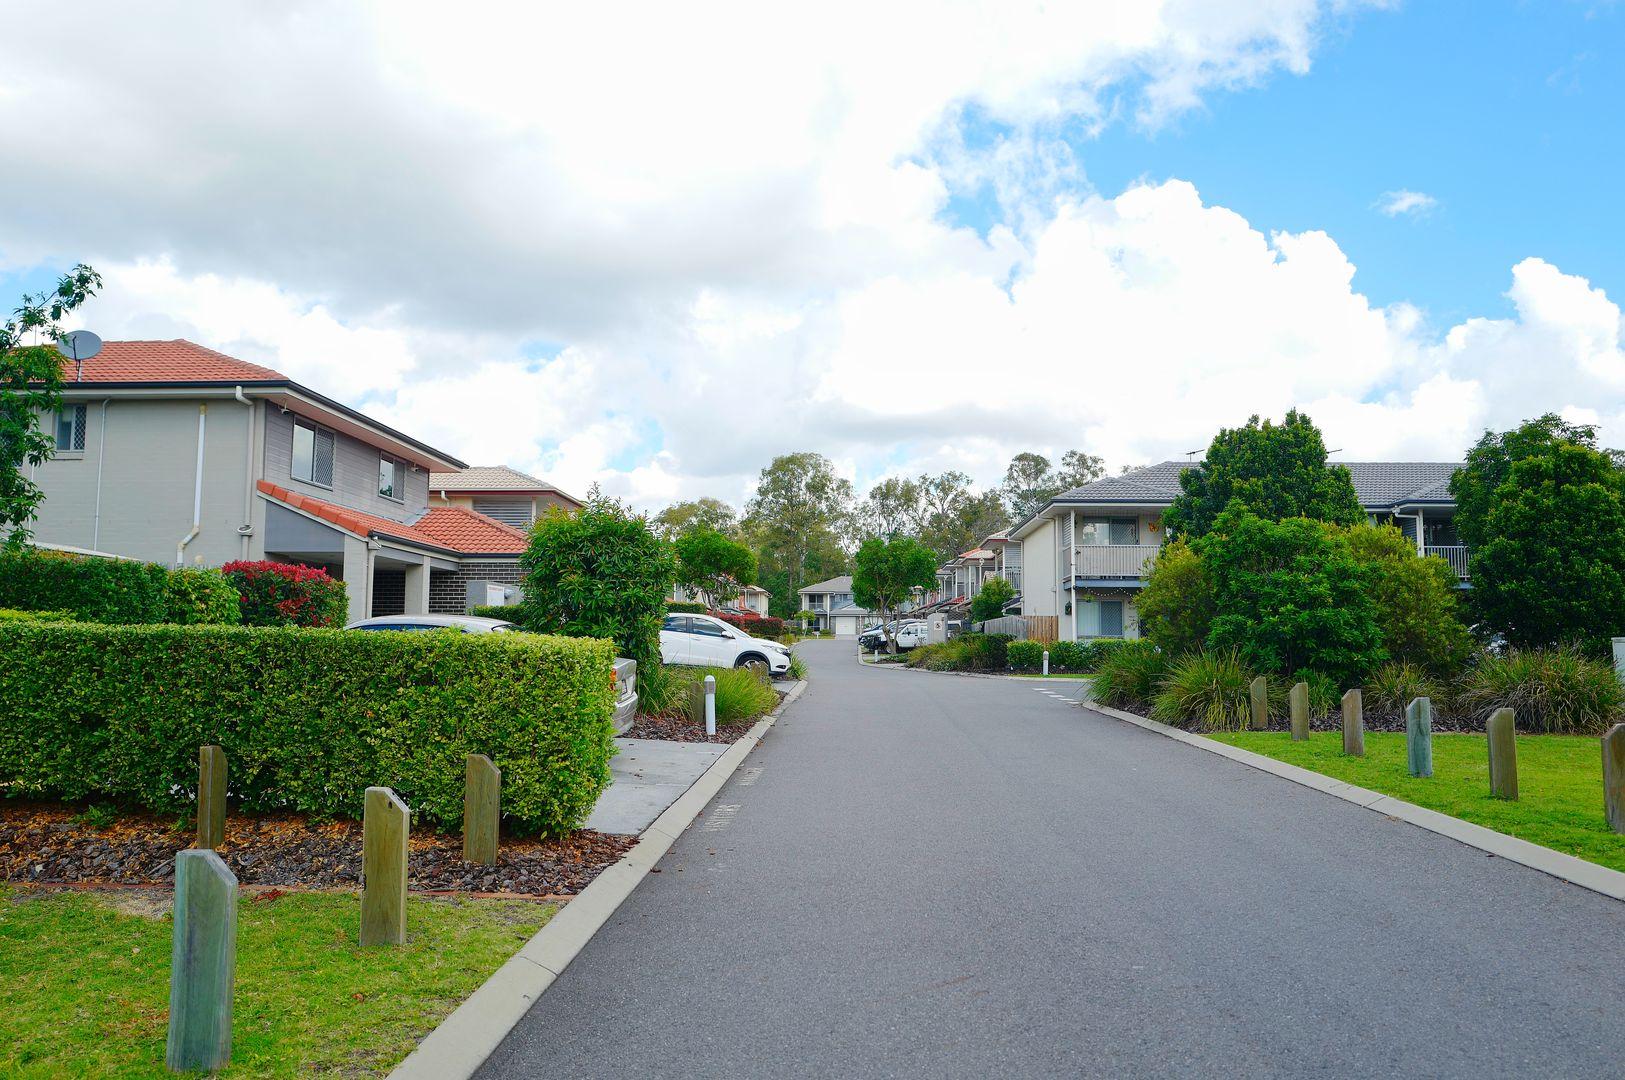 54/18a Wilga St, Wacol QLD 4076, Image 1